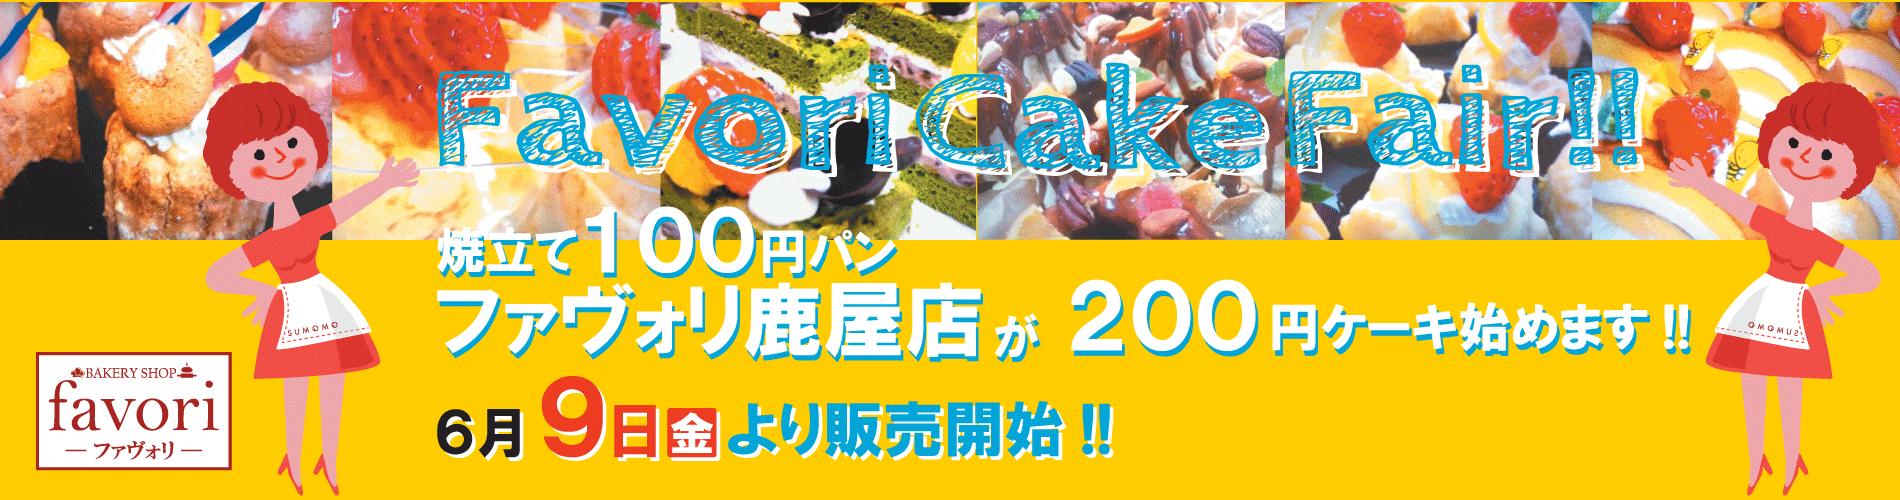 favori 鹿屋店 200円ケーキ販売開始